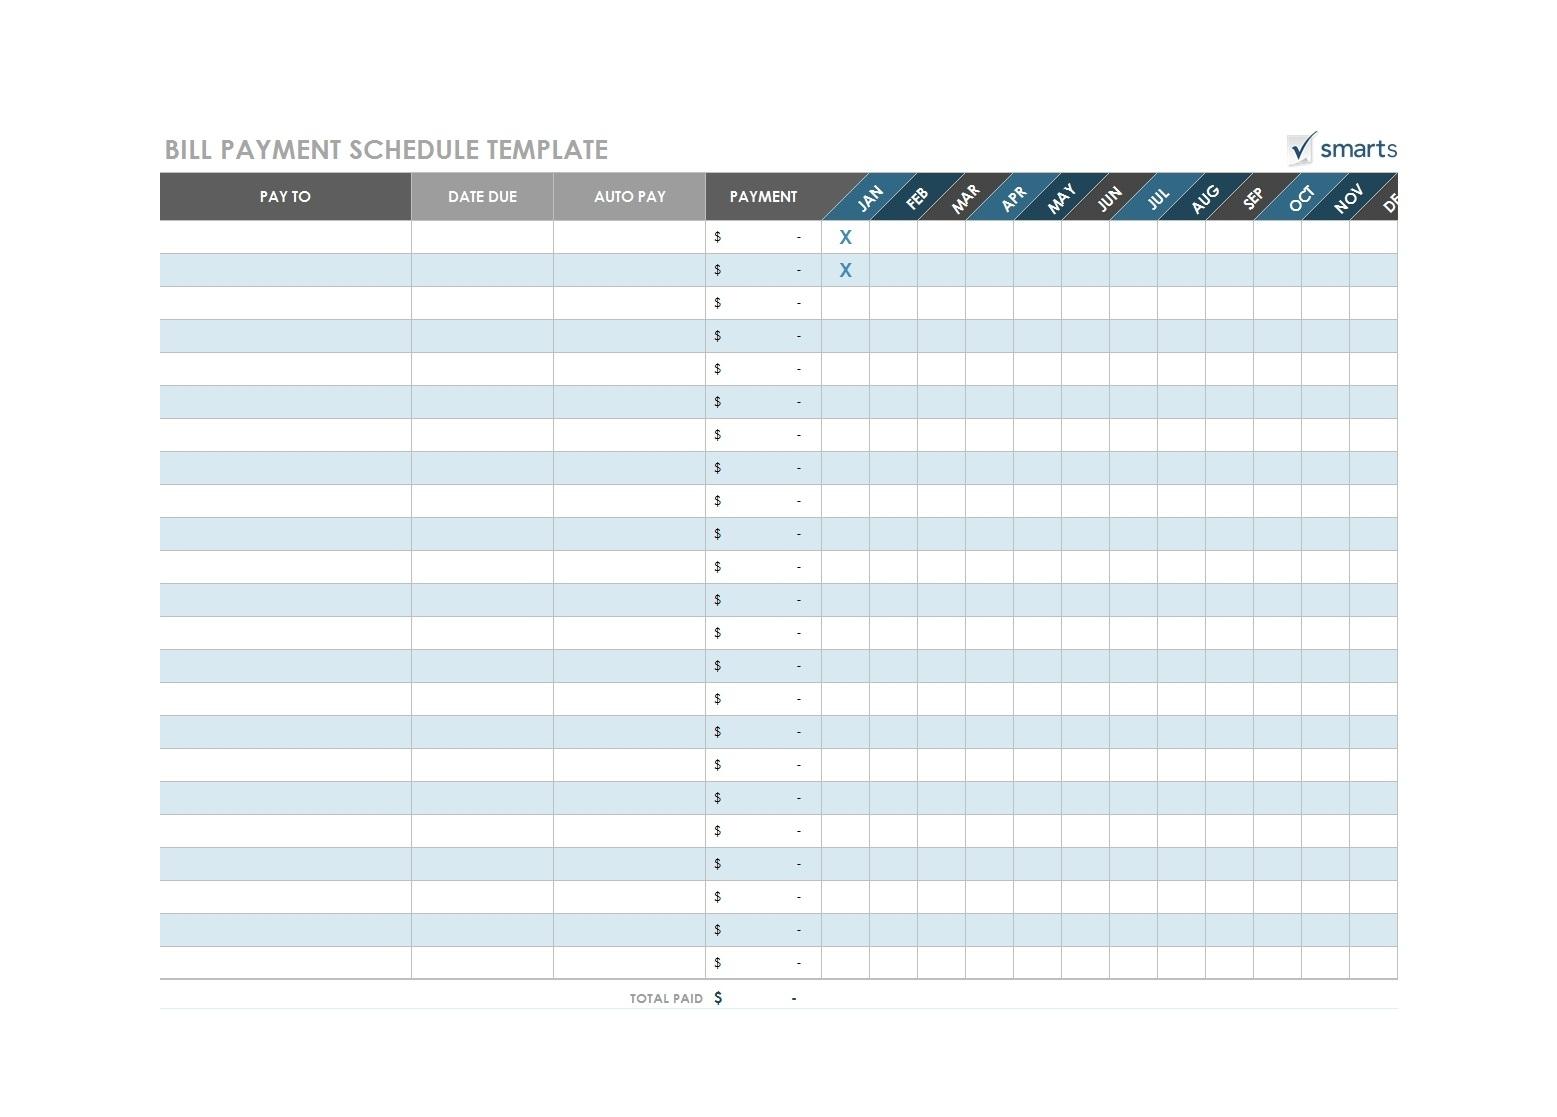 Free Printable Bill Payment Template  Calendar Inspiration intended for Free Printable Bill Payment Schedule